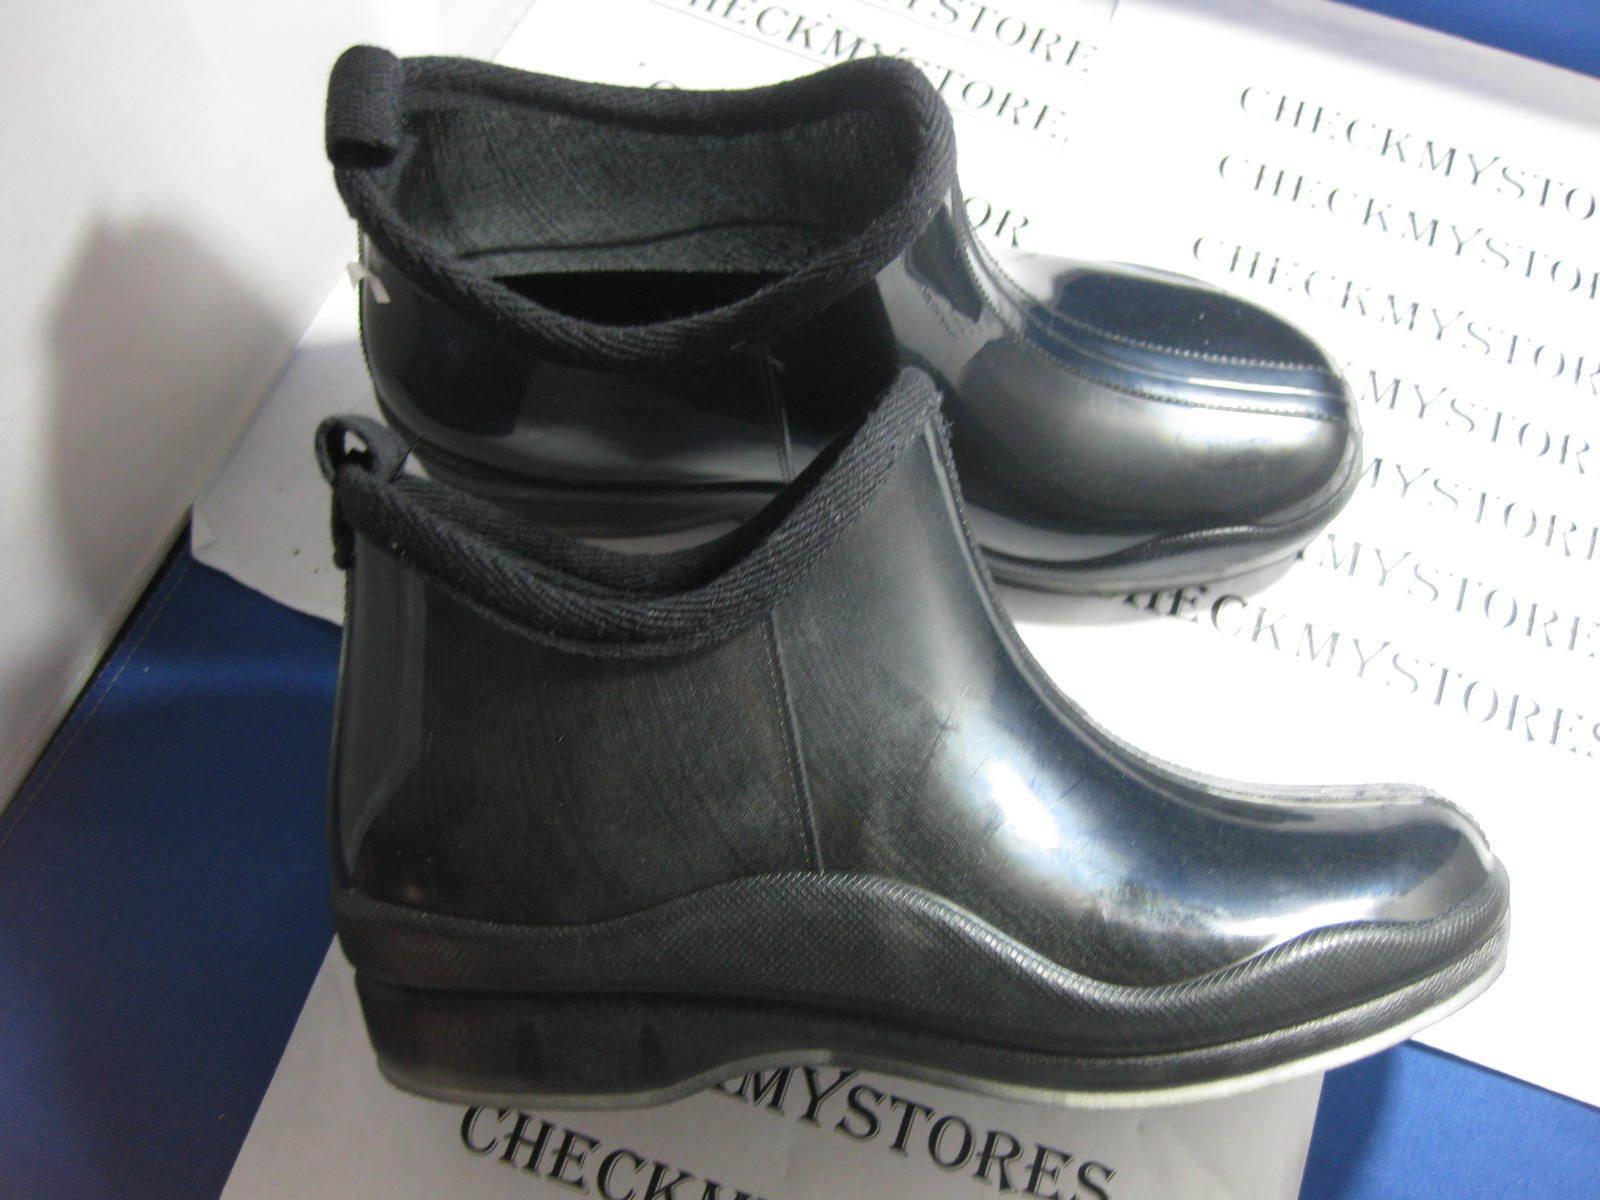 new NIB Capelli New York Shiny Black Ladies Slip-On Bootie Body Jelly Shoes sz 6